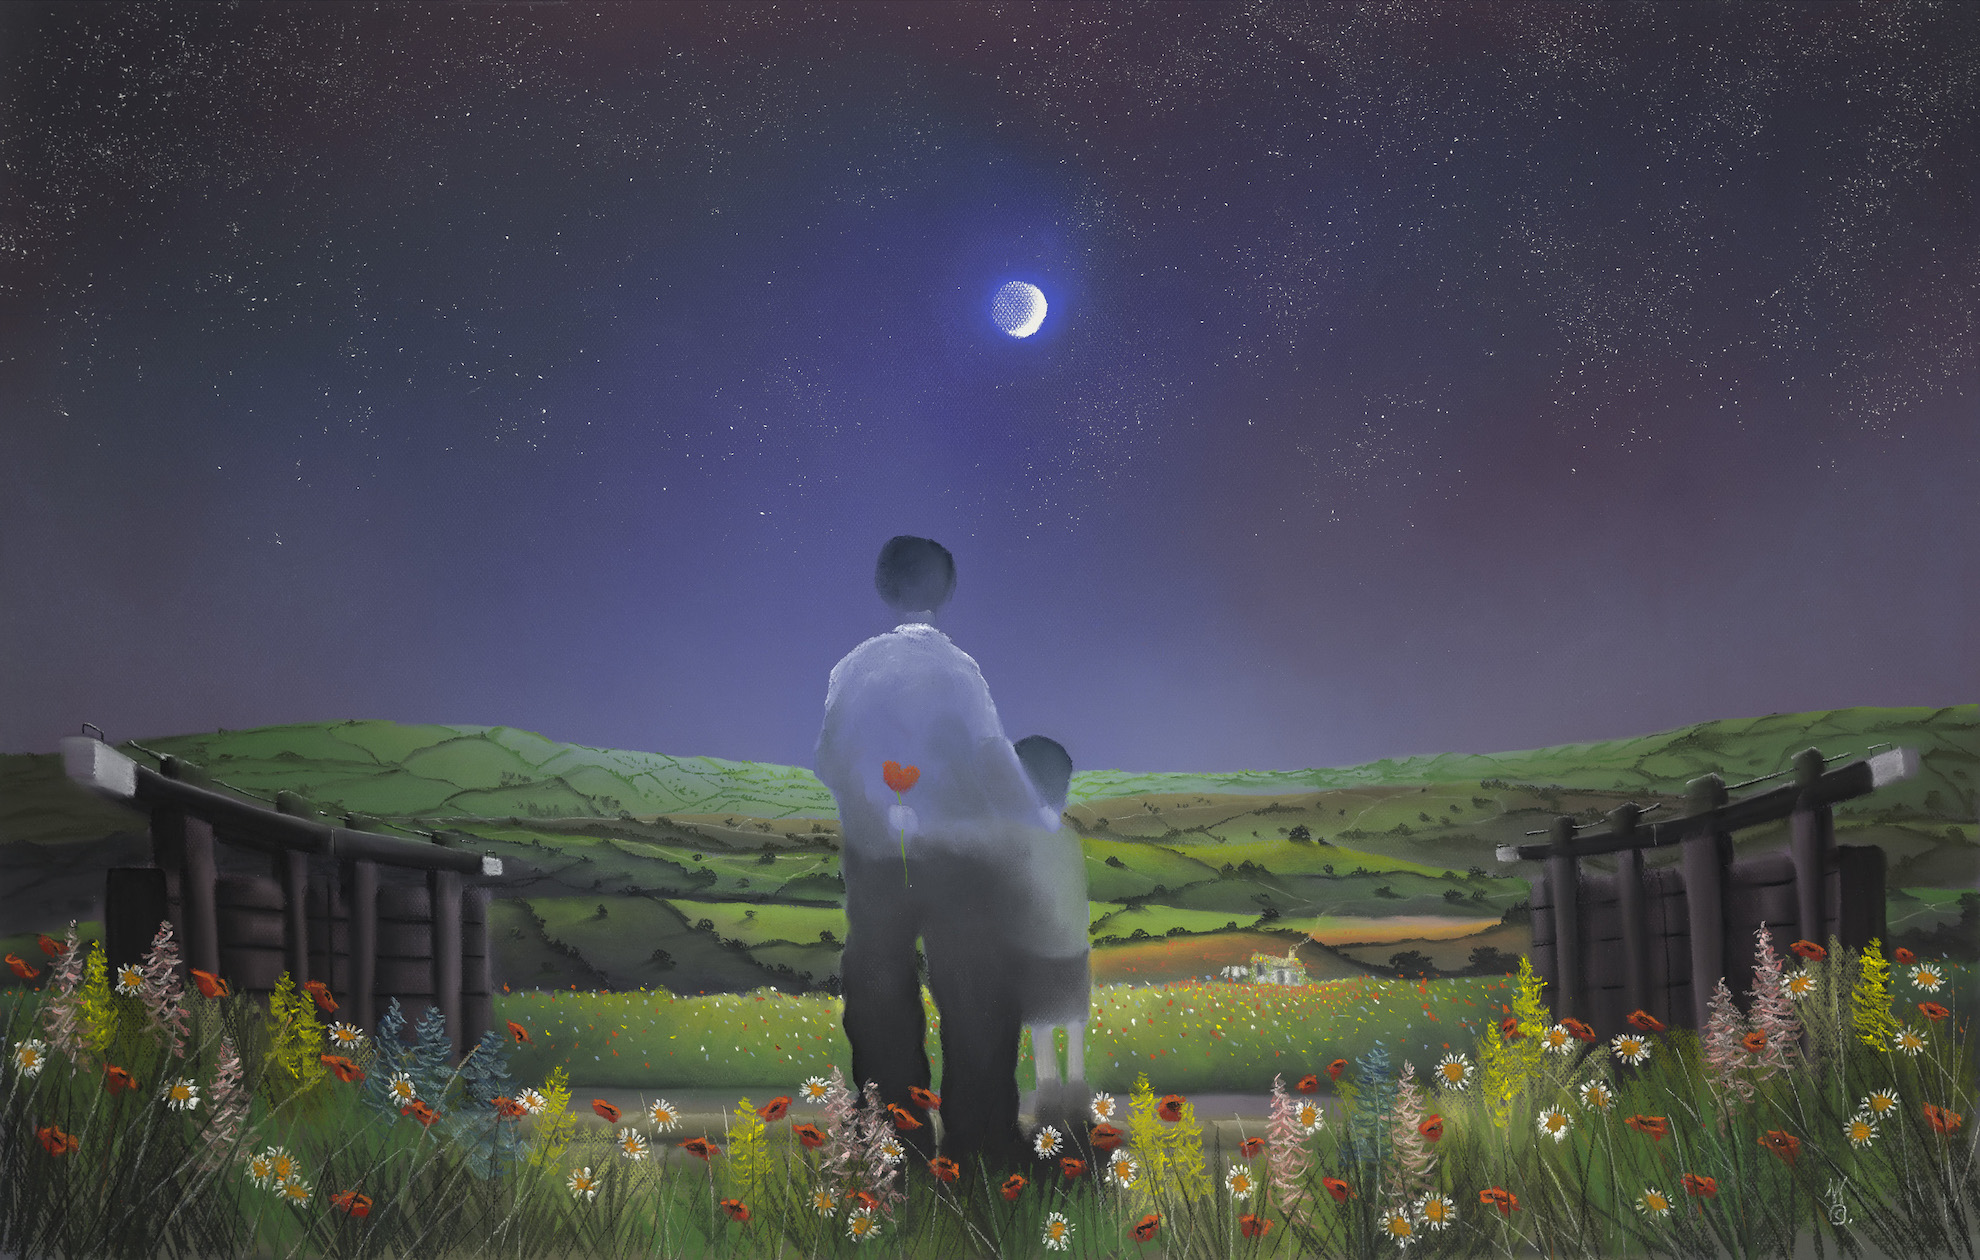 UNDER MOON AND AND STARS by Mackenzie Thorpe